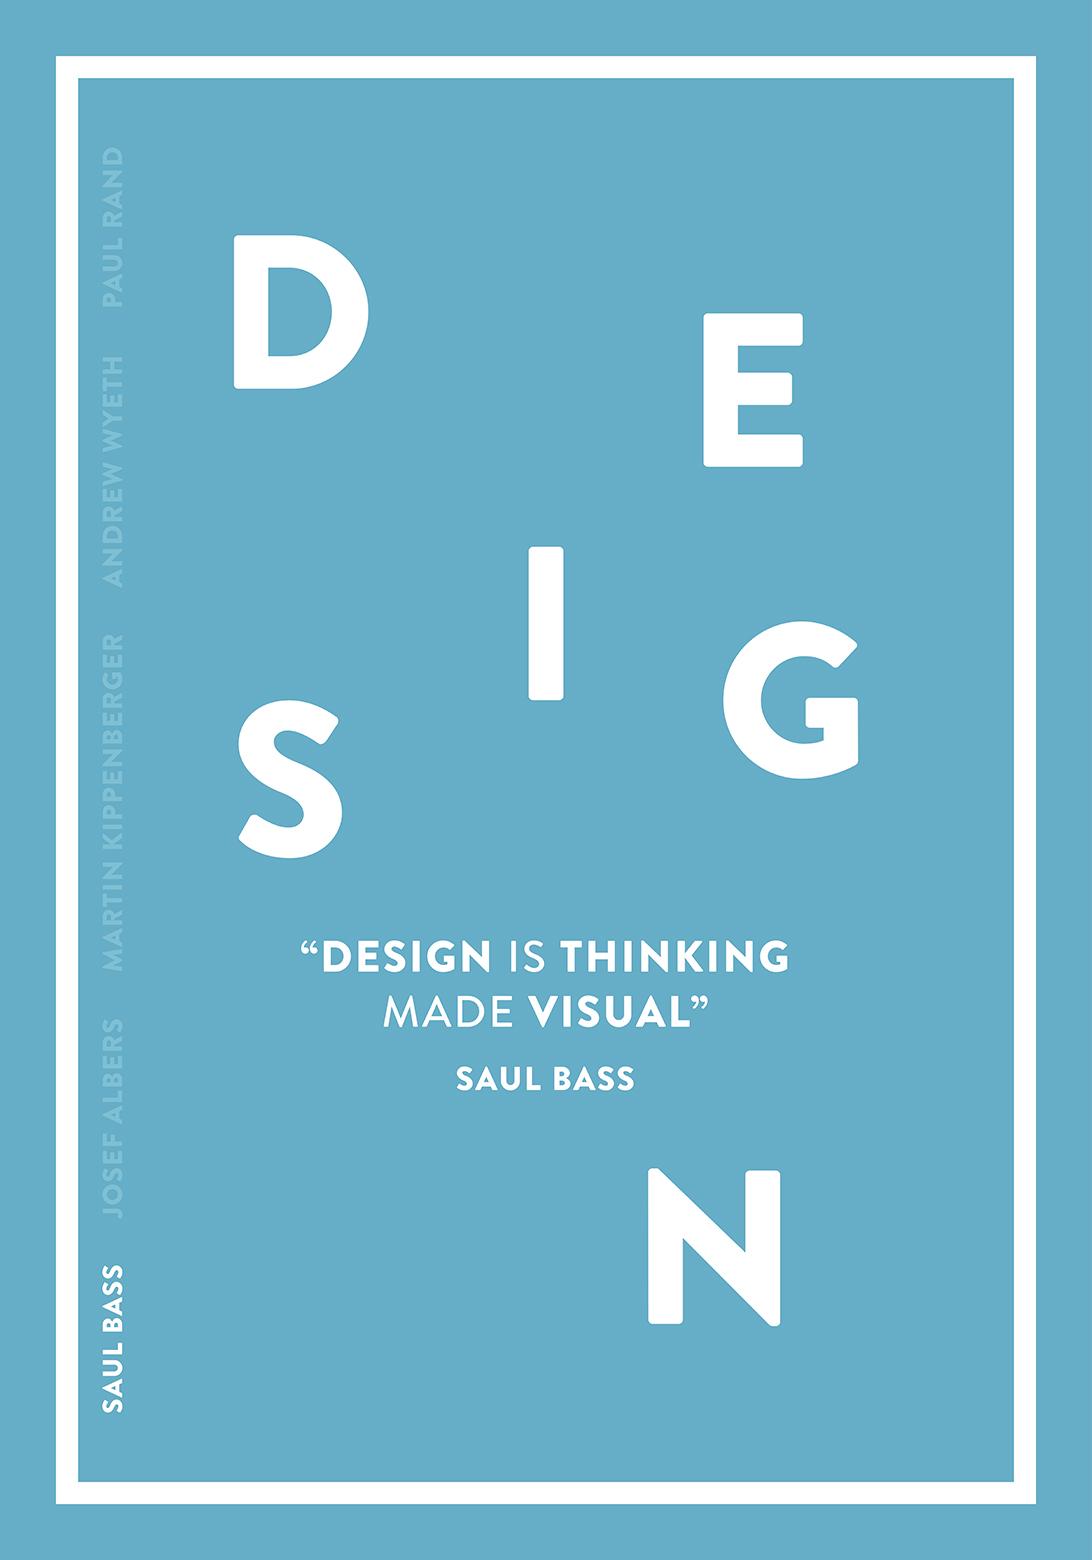 Saul Bass Design Is Thinking Made Visual Eye On Design